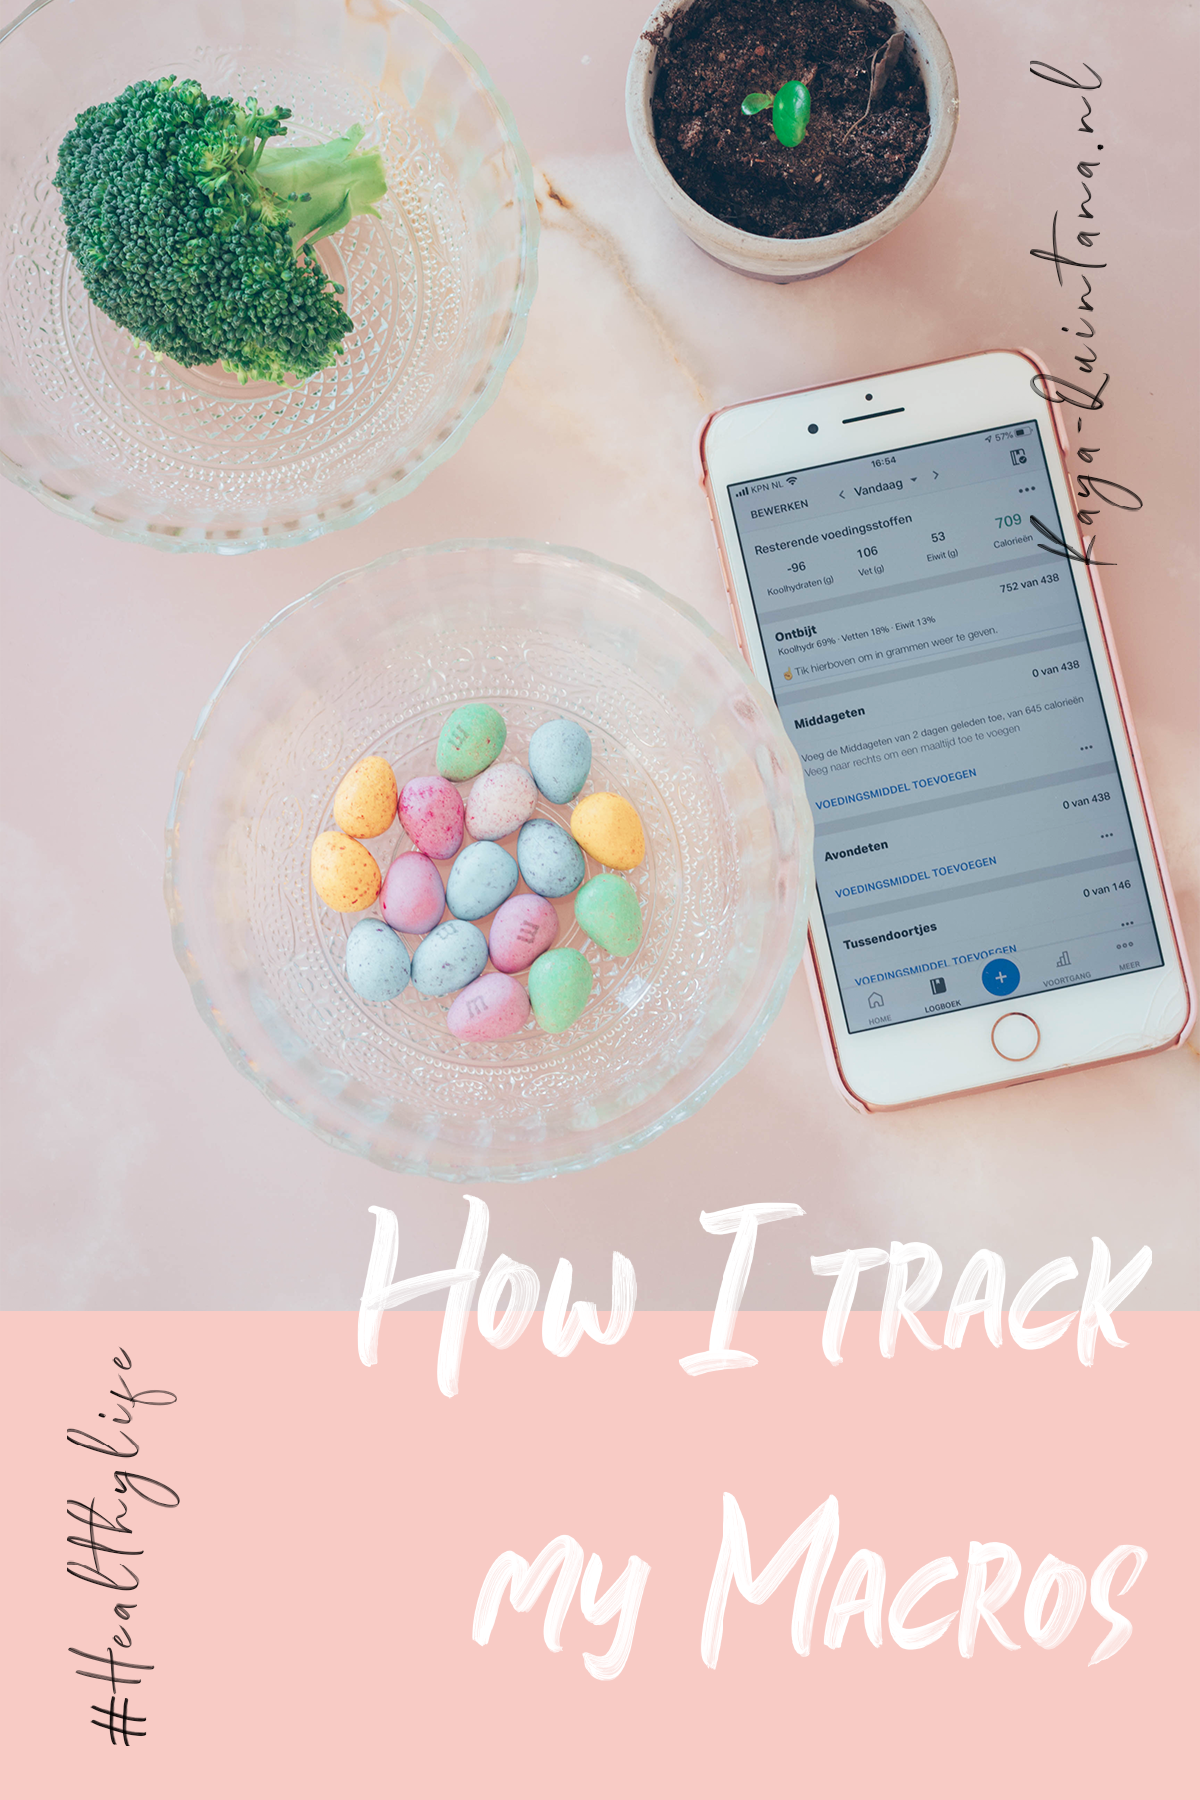 How I track my macros